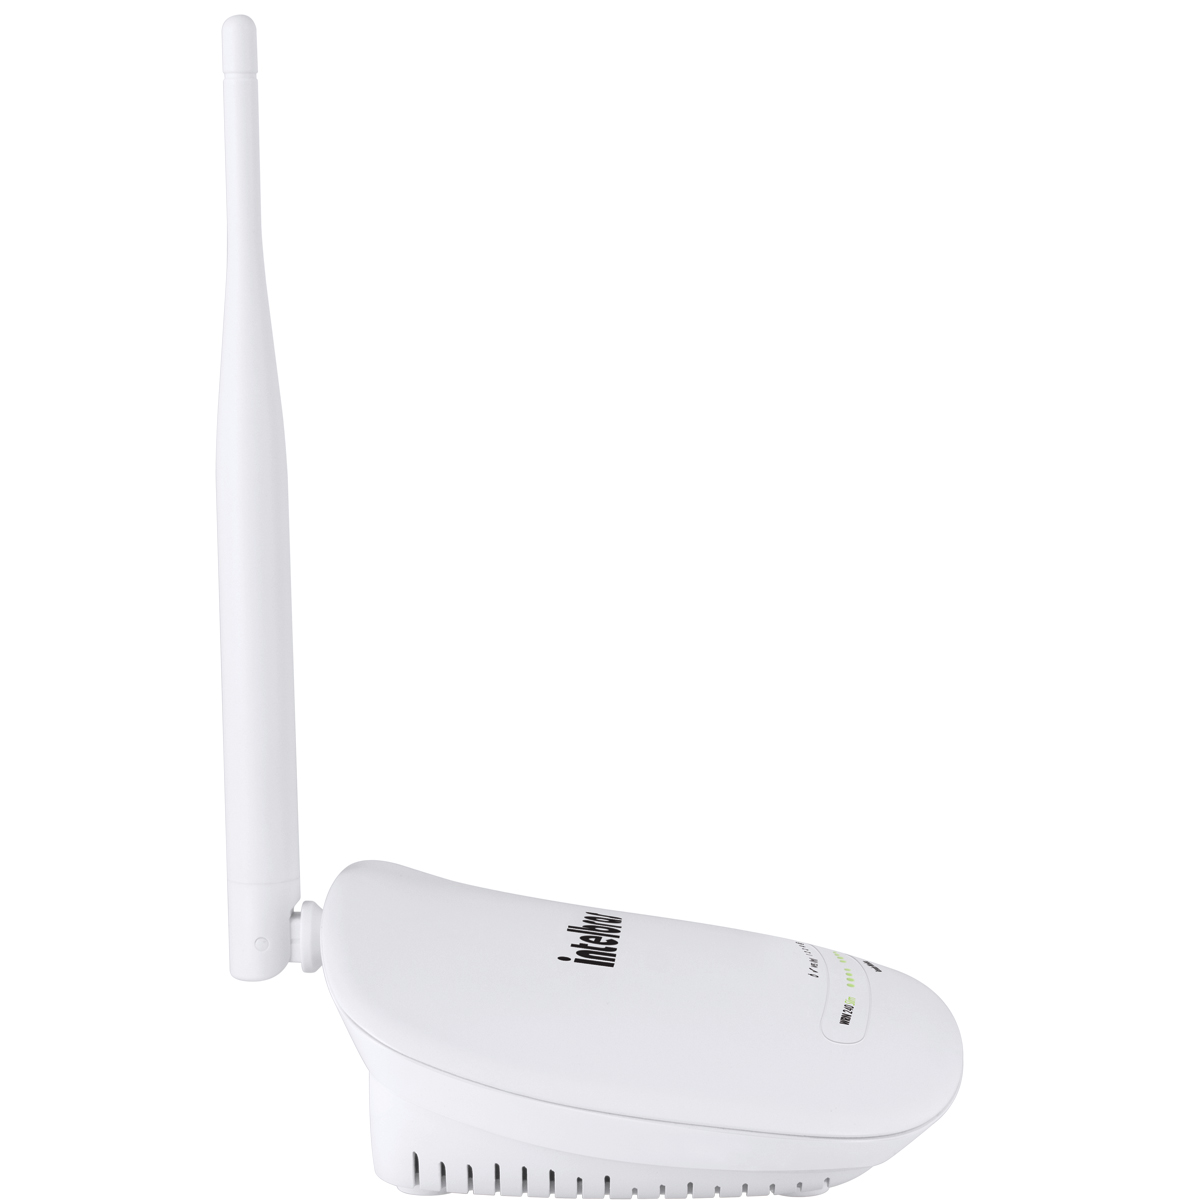 Roteador Intelbras 150mbps Wrn241 Wireless N Antena Removível  Branco